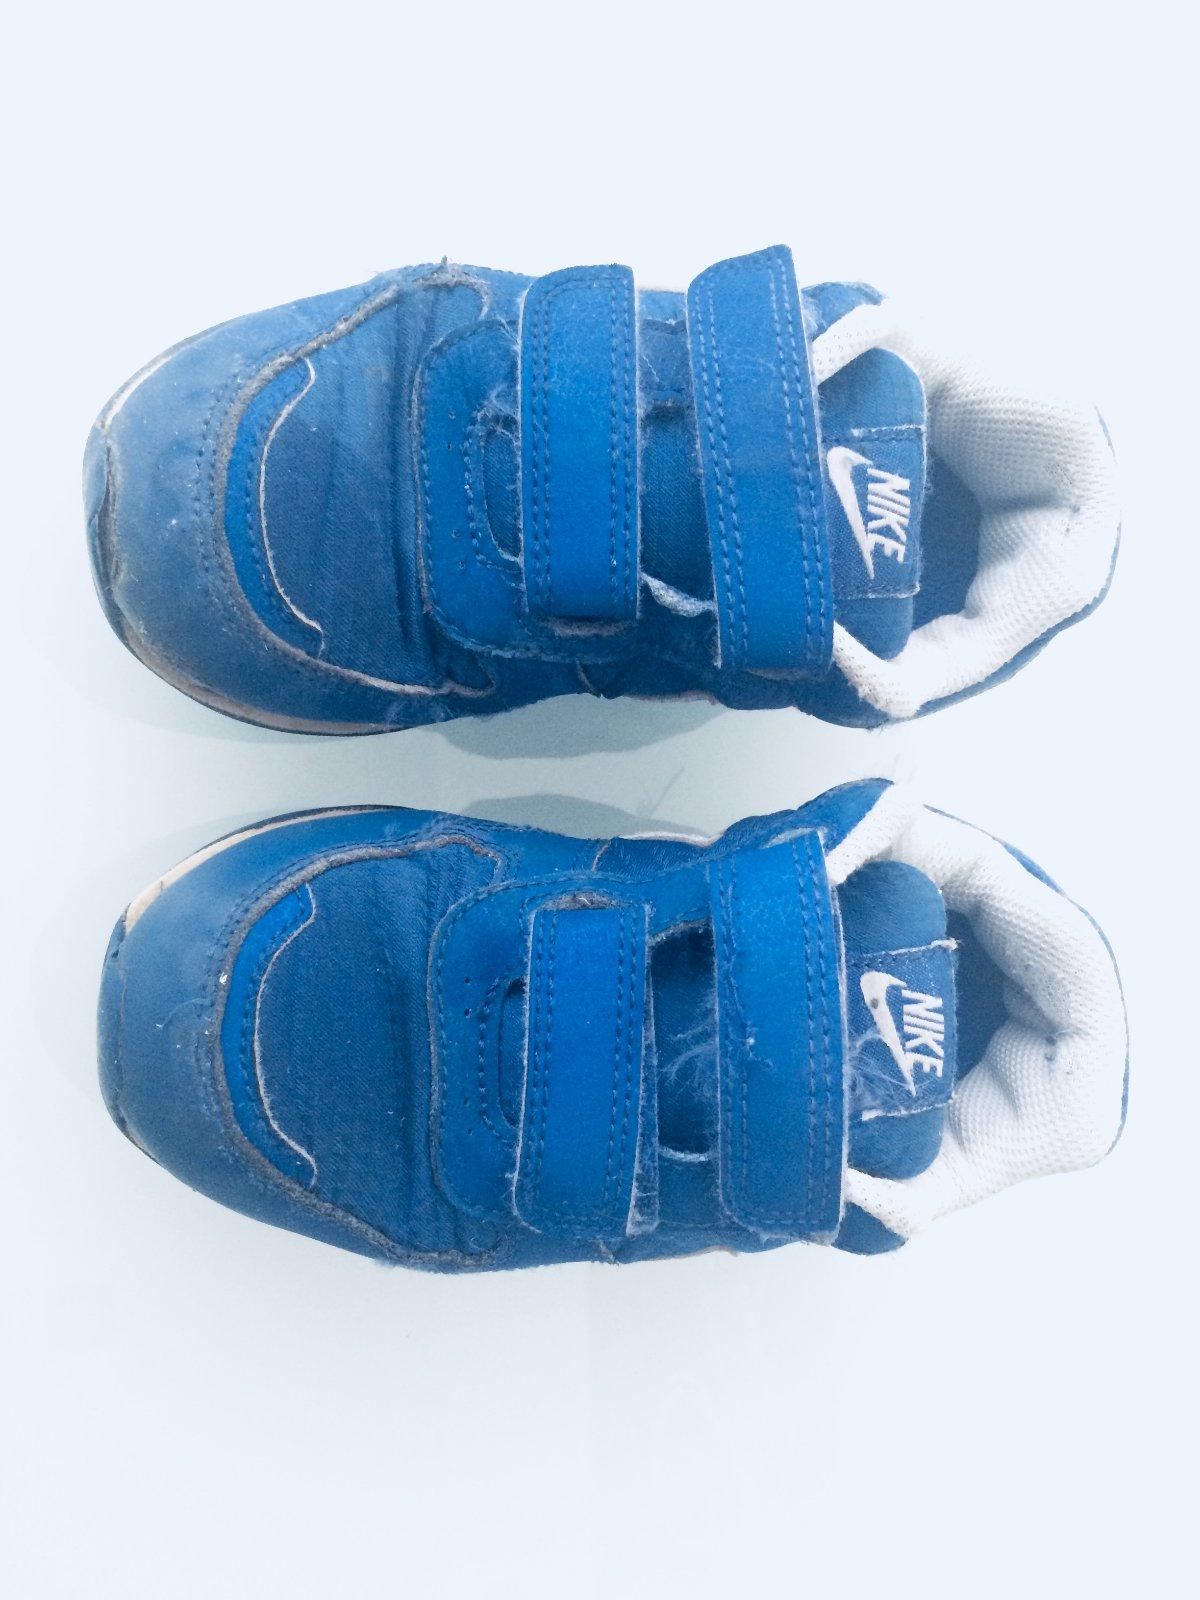 2be08485be V prípade kúpy vyžadujem platbu vopred na účet a následne tovar odošlem  ) Detské  chlapčenské botasky ...